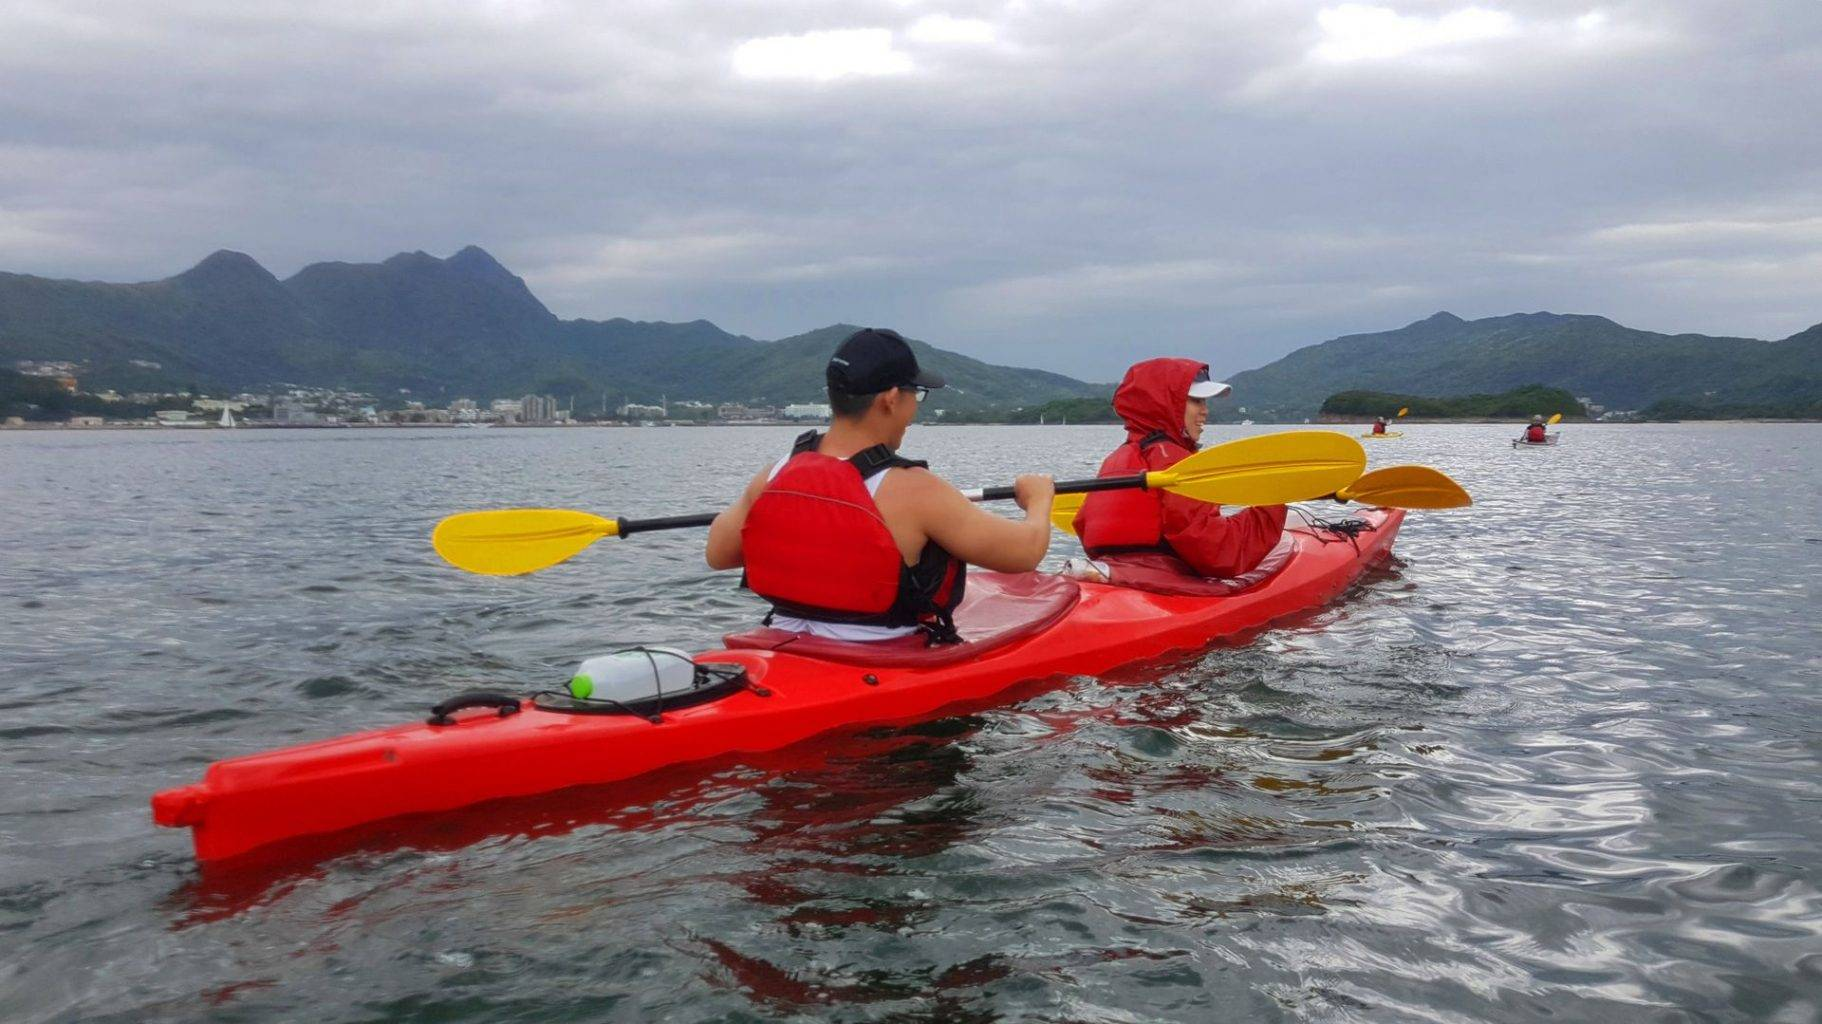 19 Apr 2019 UNESCO Geopark 1 day sea kayak trip Hong Kong_11